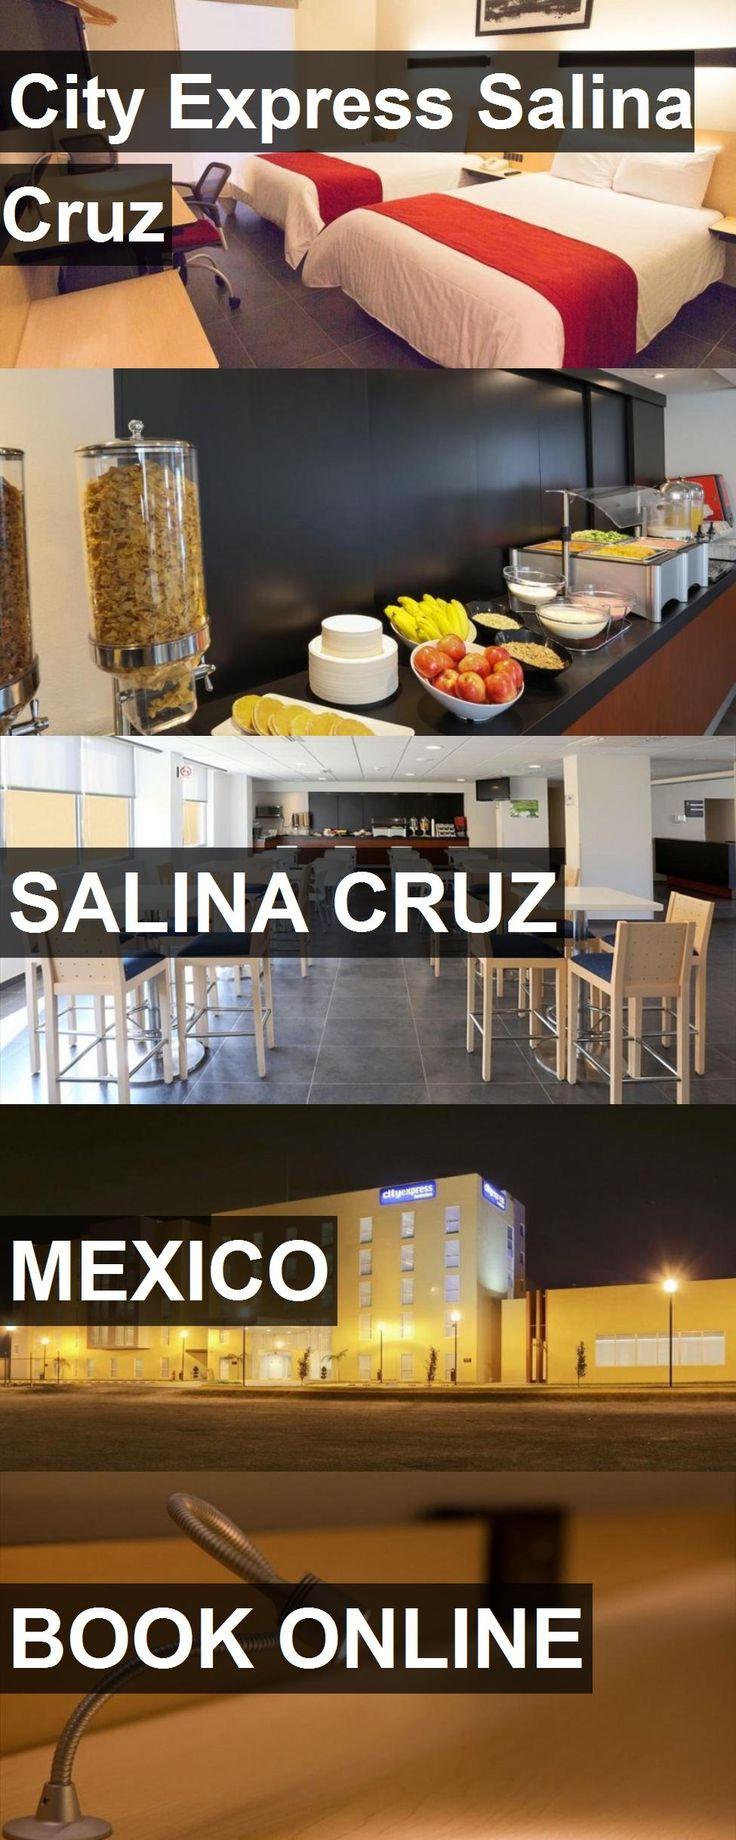 Hotel City Express Salina Cruz in Salina Cruz, Mexico. For more information, photos, reviews and best prices please follow the link. #Mexico #SalinaCruz #travel #vacation #hotel